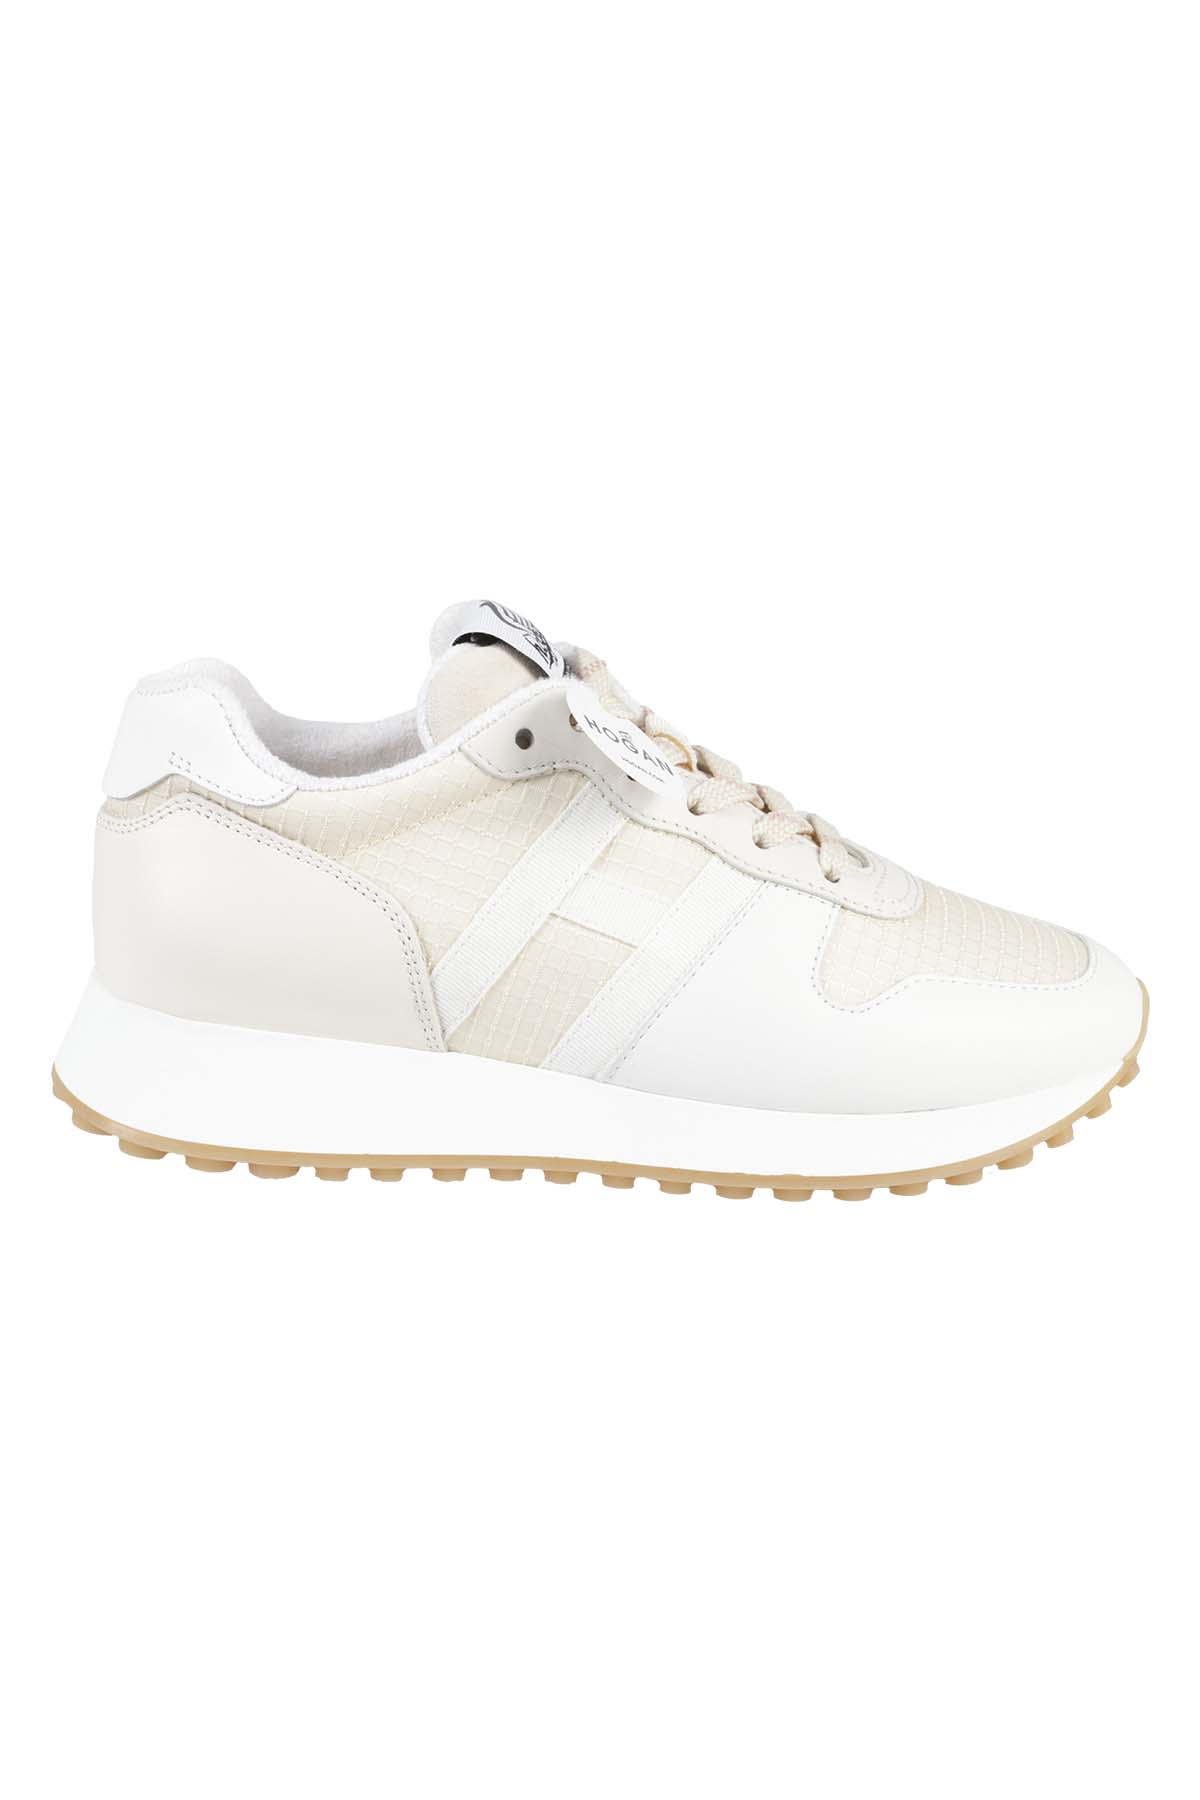 Hogan Sneakers In Srb Panna | ModeSens